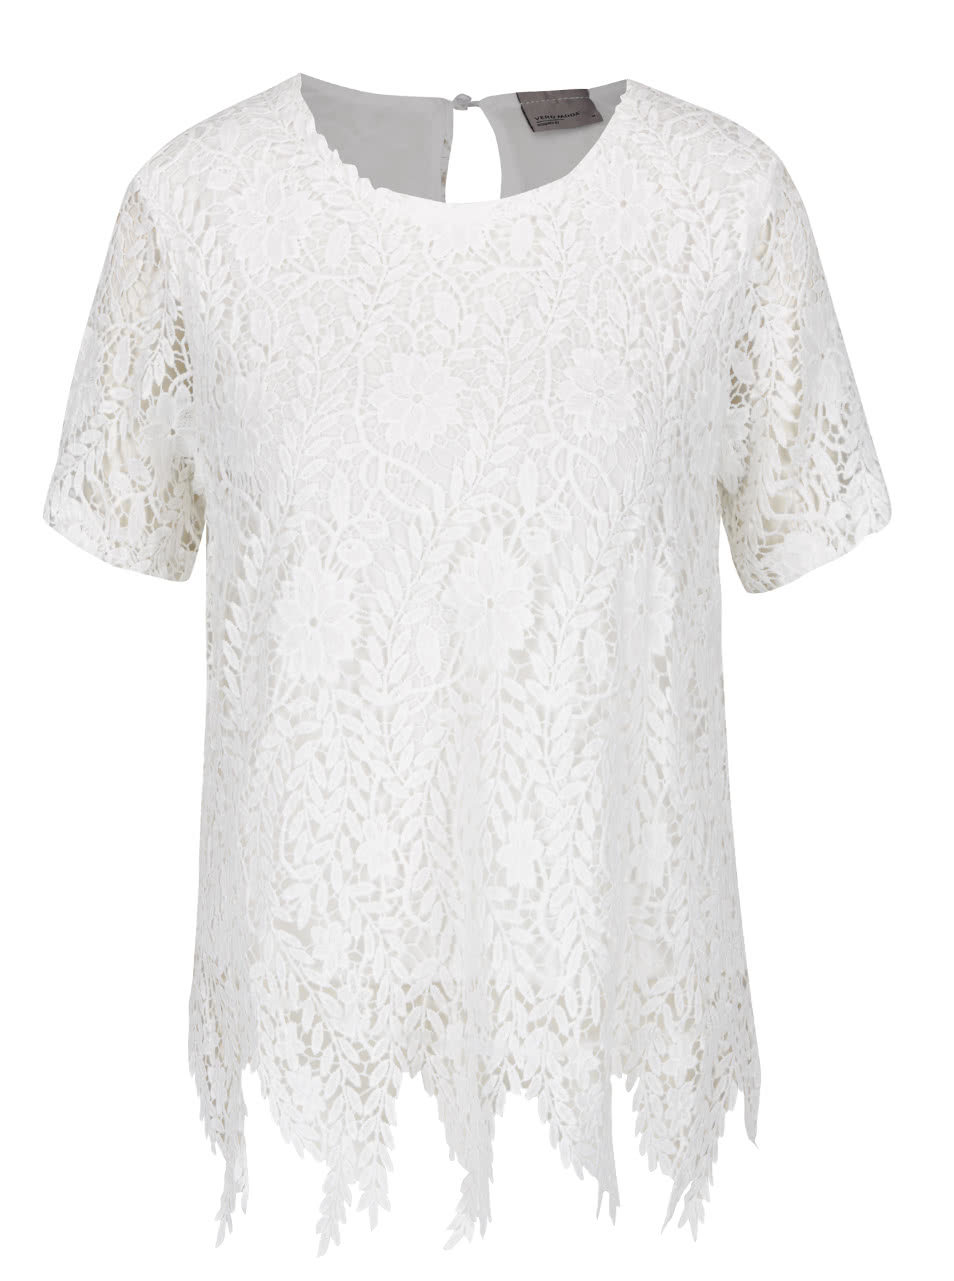 28945079f3 Bílé krajkové tričko VERO MODA Flora ...